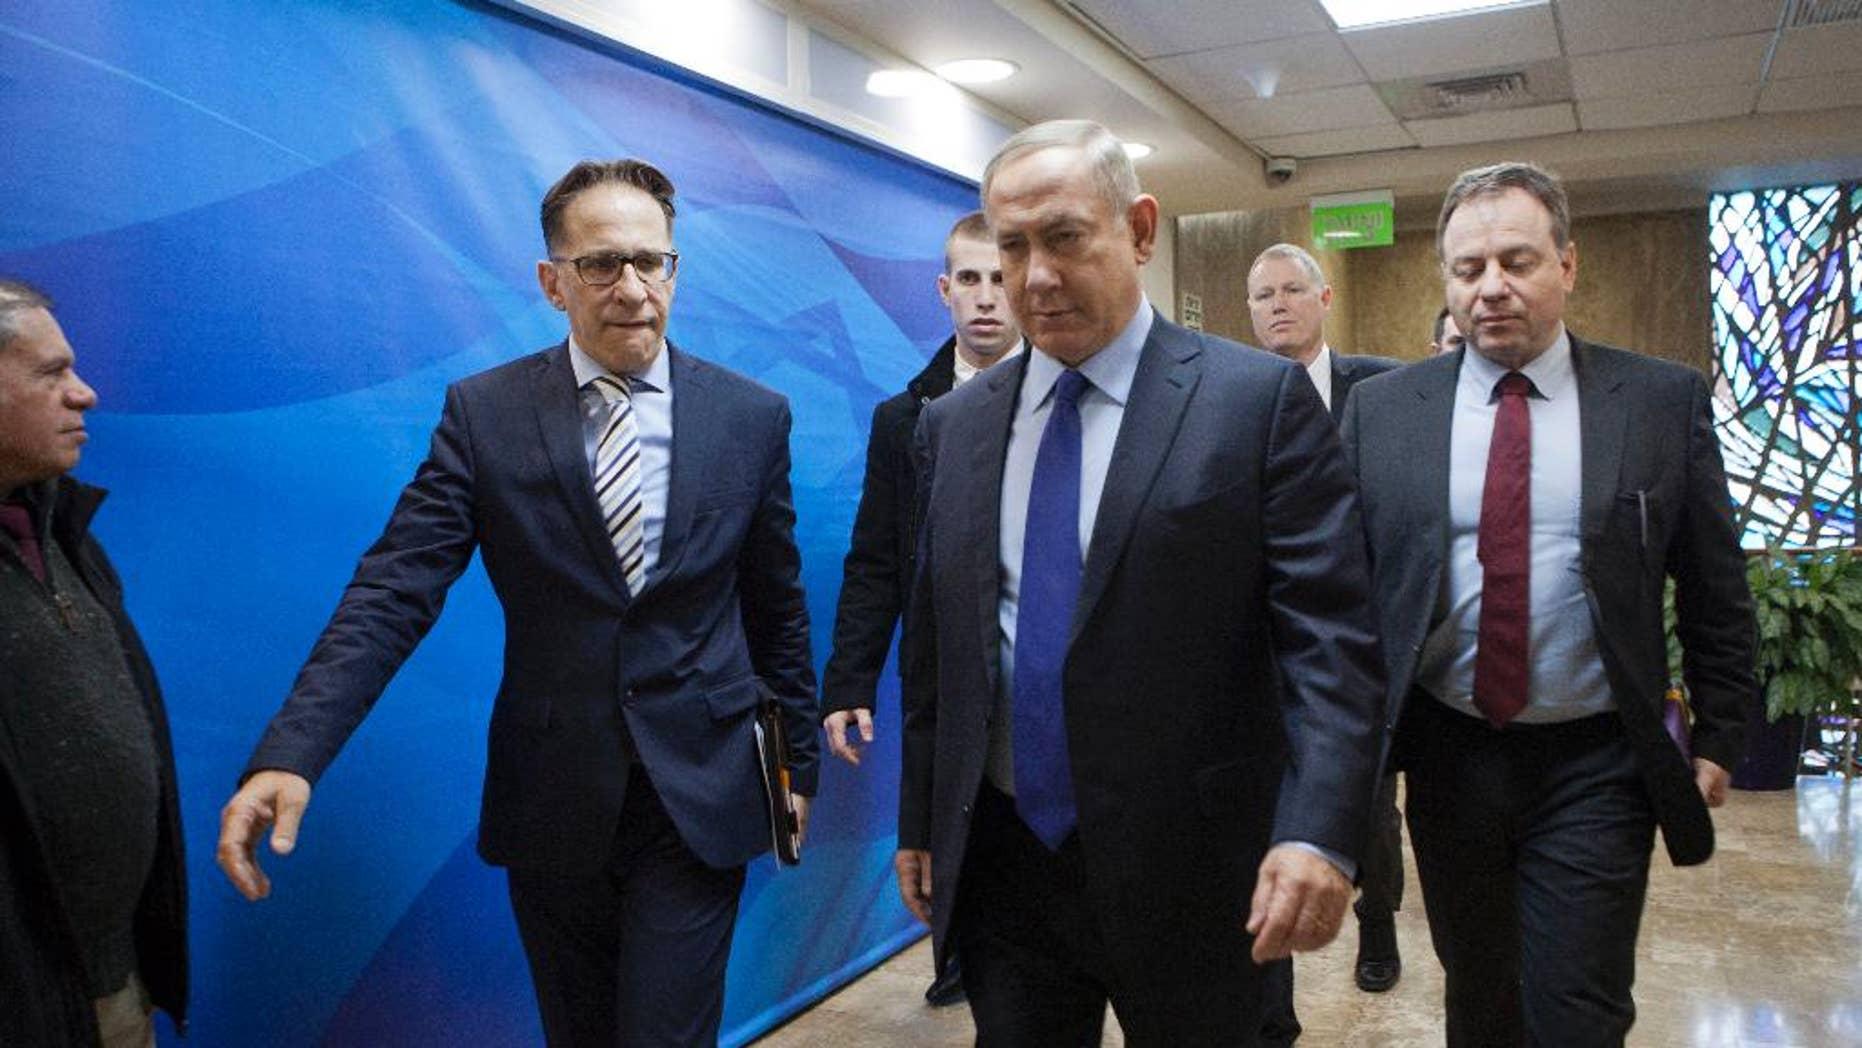 Israeli Prime Minister Benjamin Netanyahu, second right, arrives for a weekly cabinet meeting in Jerusalem, Sunday, Dec. 25, 2016. (Dan Balilty/Pool photo via AP)